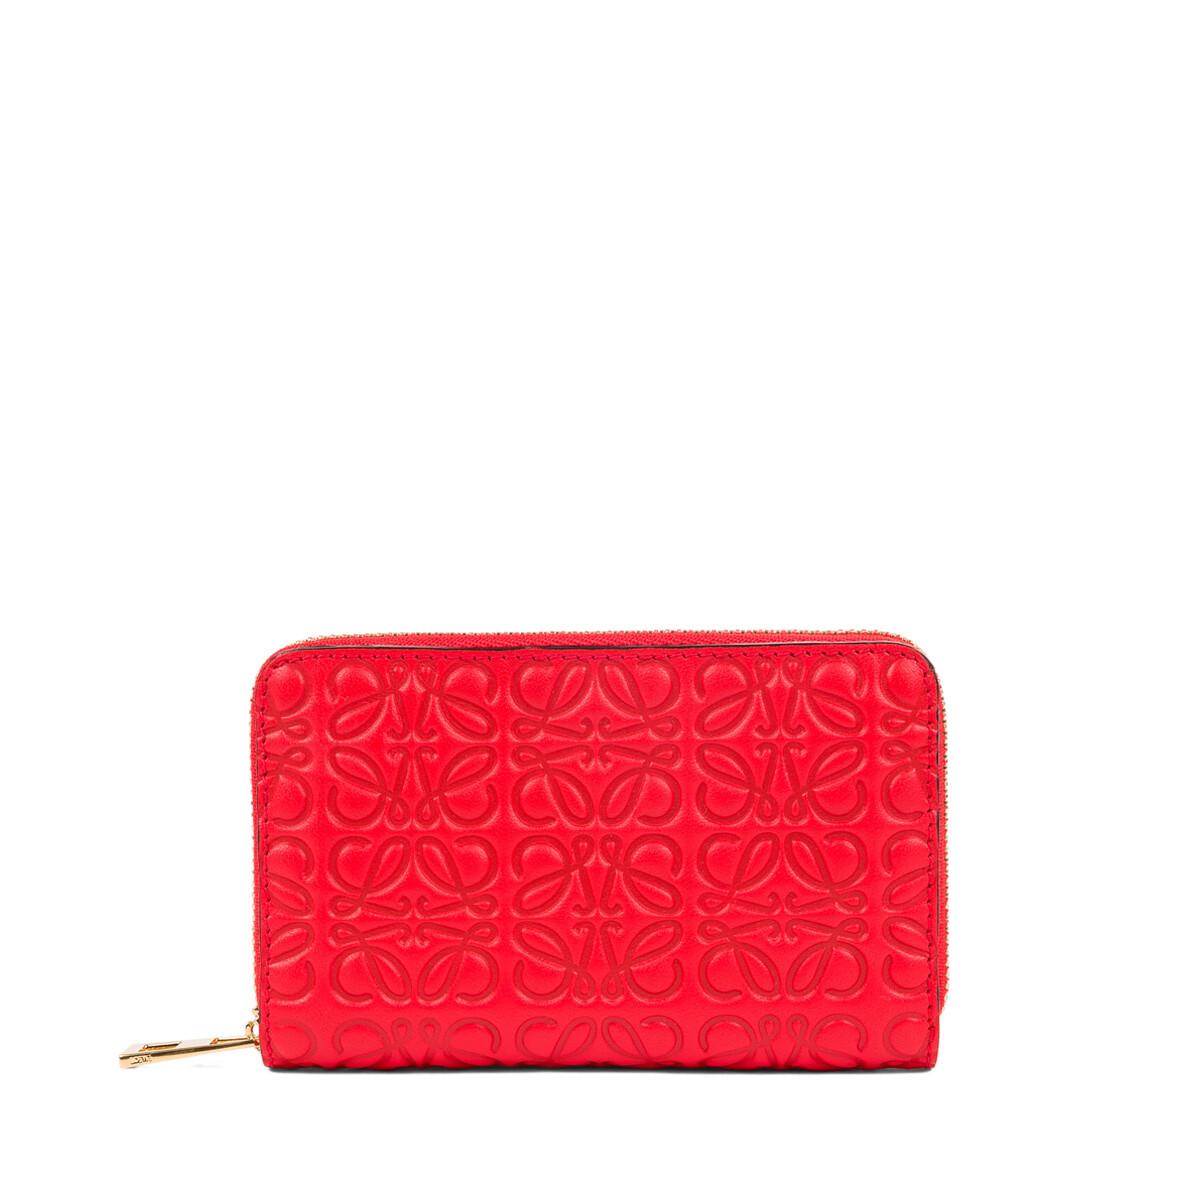 LOEWE Zip Card Holder Primary Red front